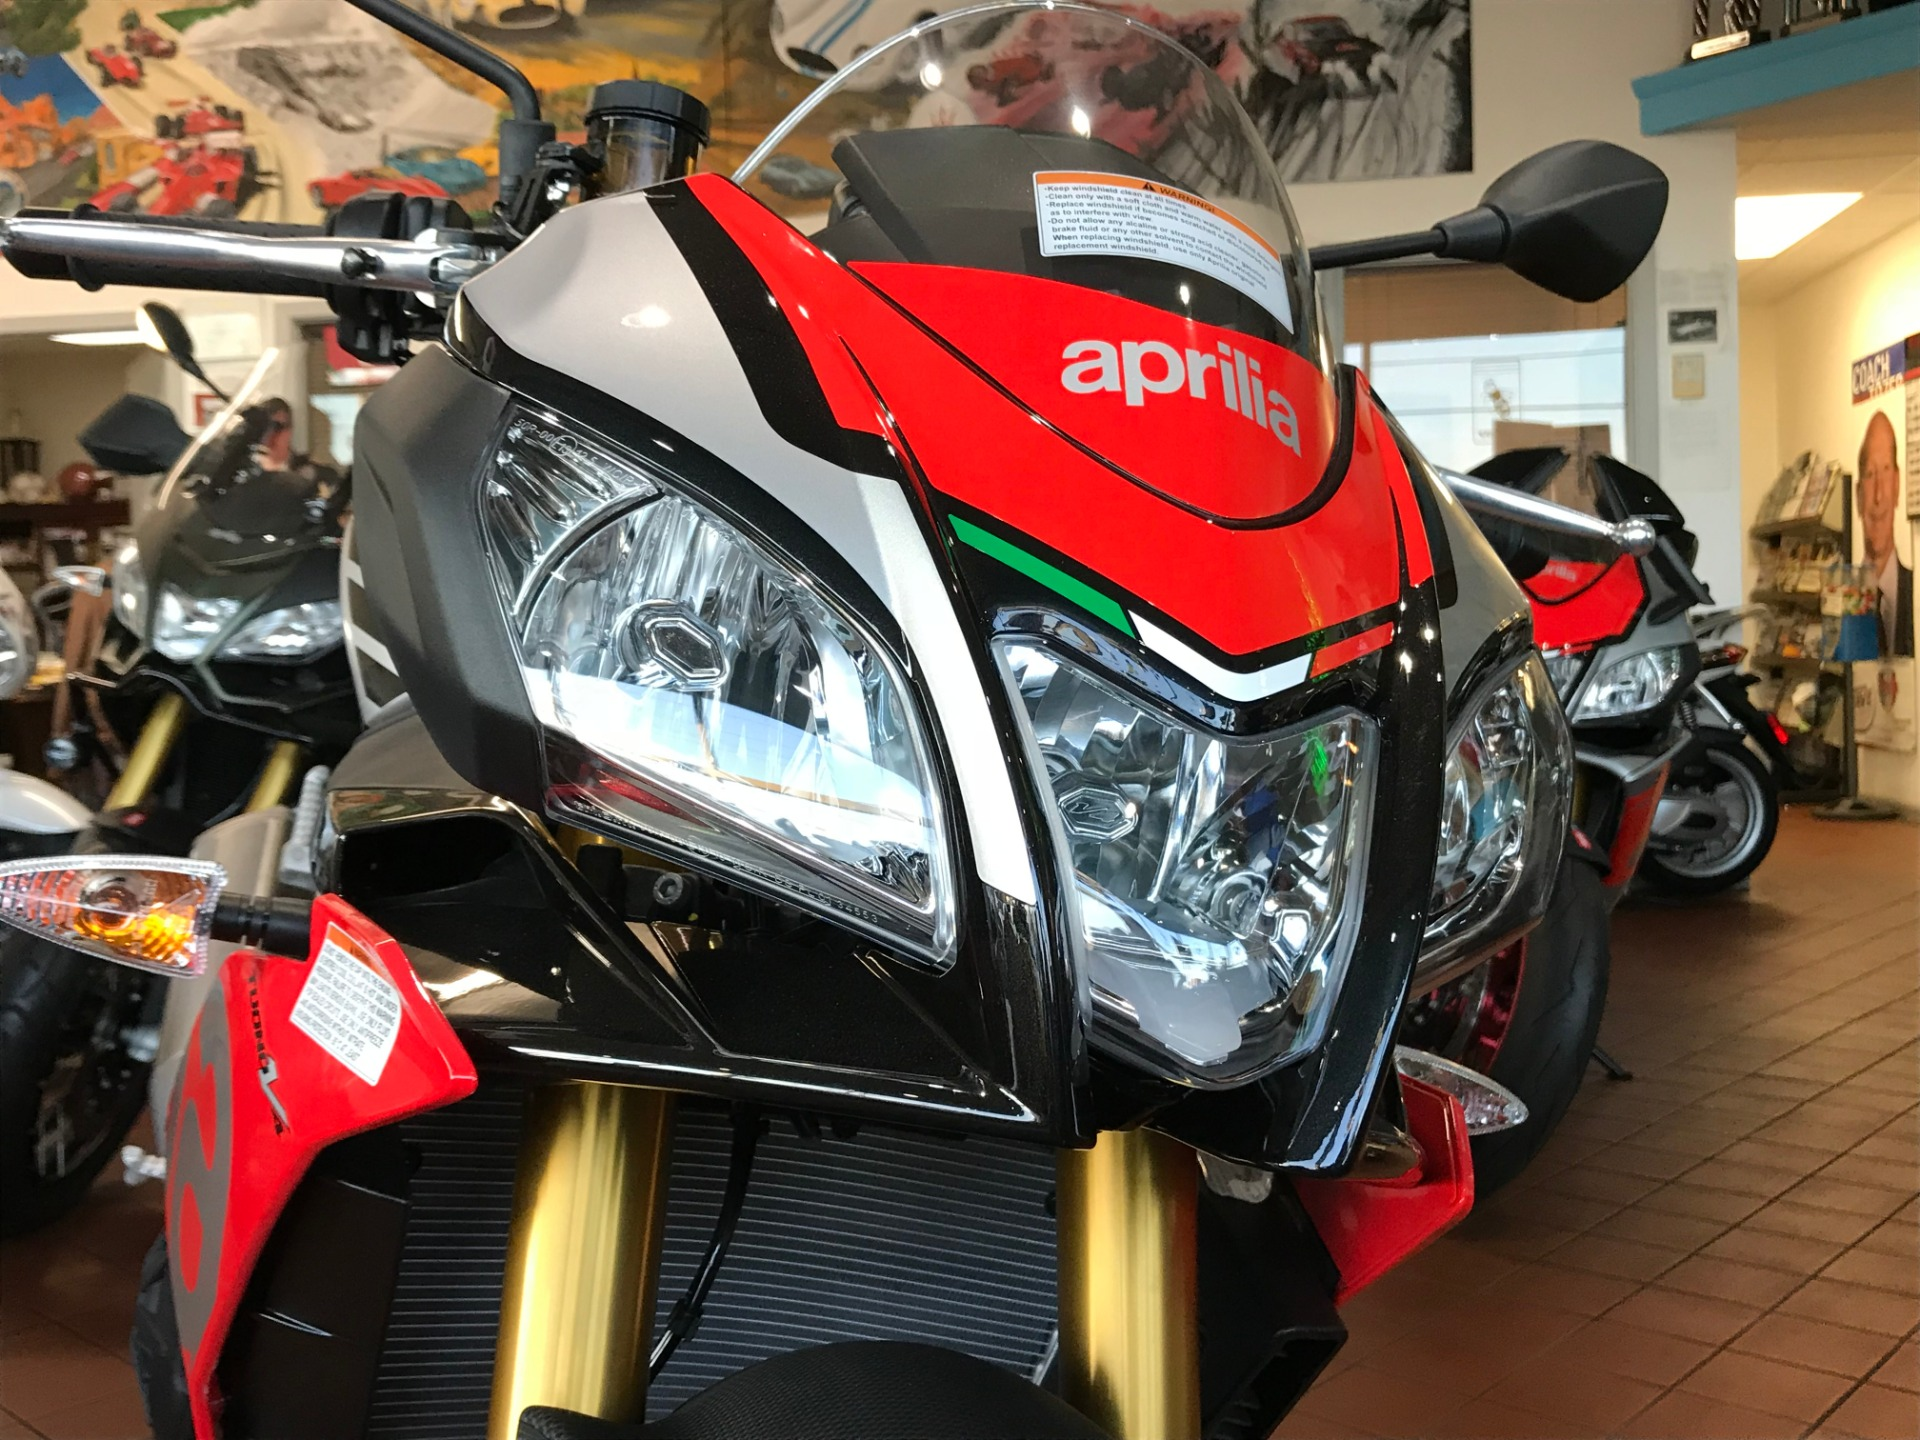 New-2018-Aprilia-Tuono-V4-1100-Factory